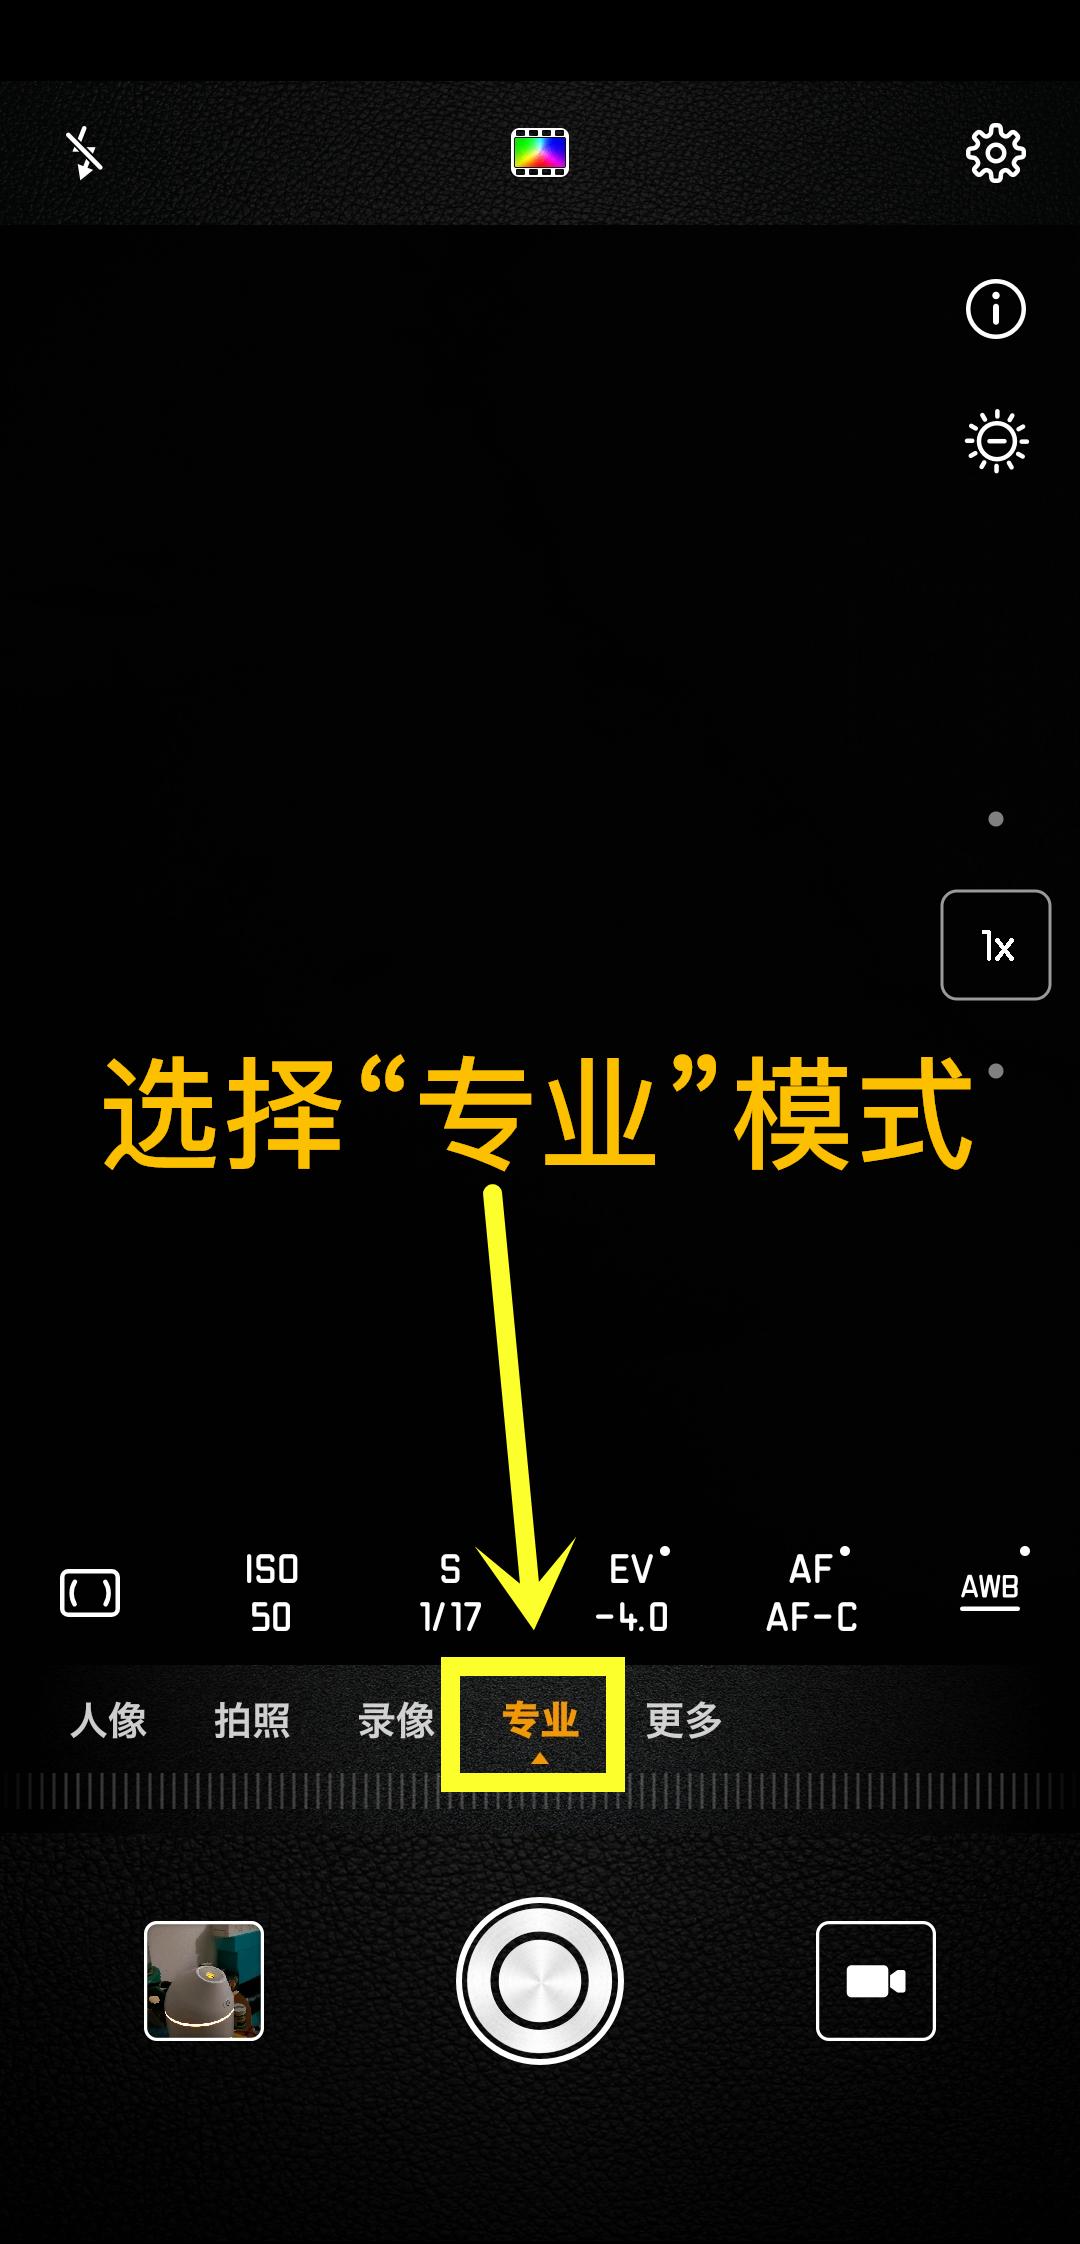 Screenshot_20181127_085935_com.huawei.camera.jpg